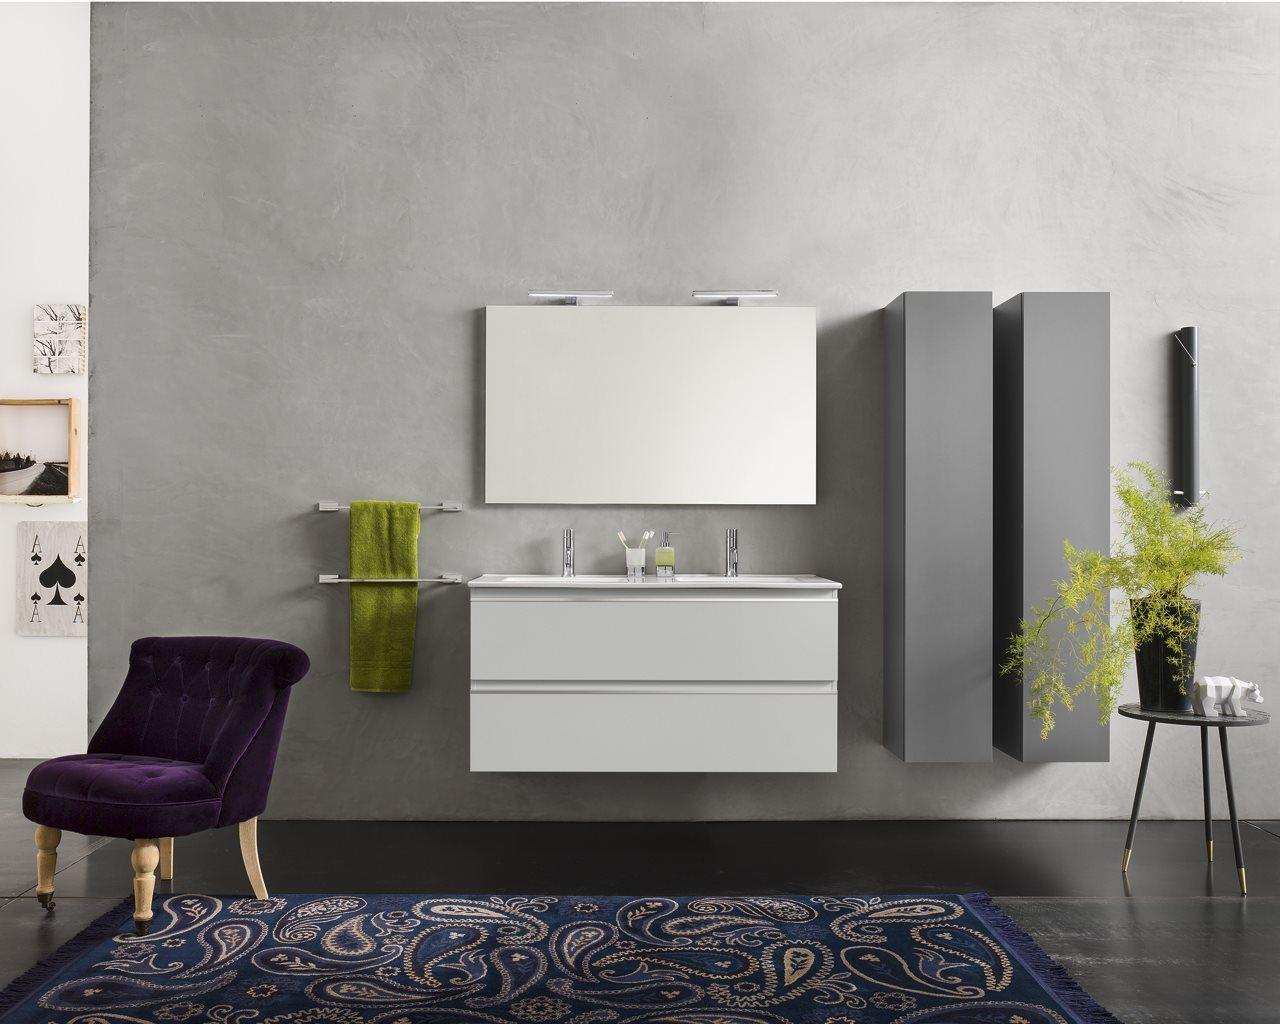 Emejing Box Doccia Inda Pictures - Modern Design Ideas ...